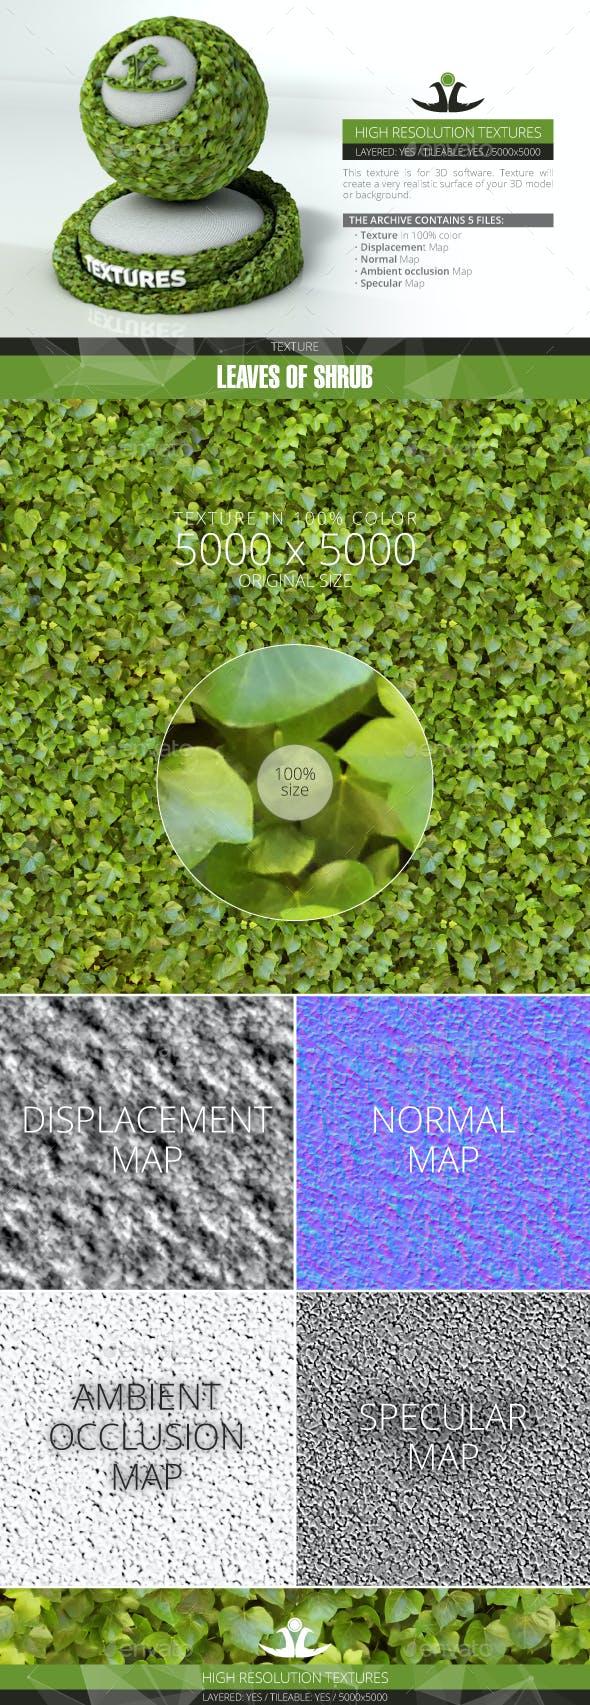 Leaves of Shrub - 3DOcean Item for Sale